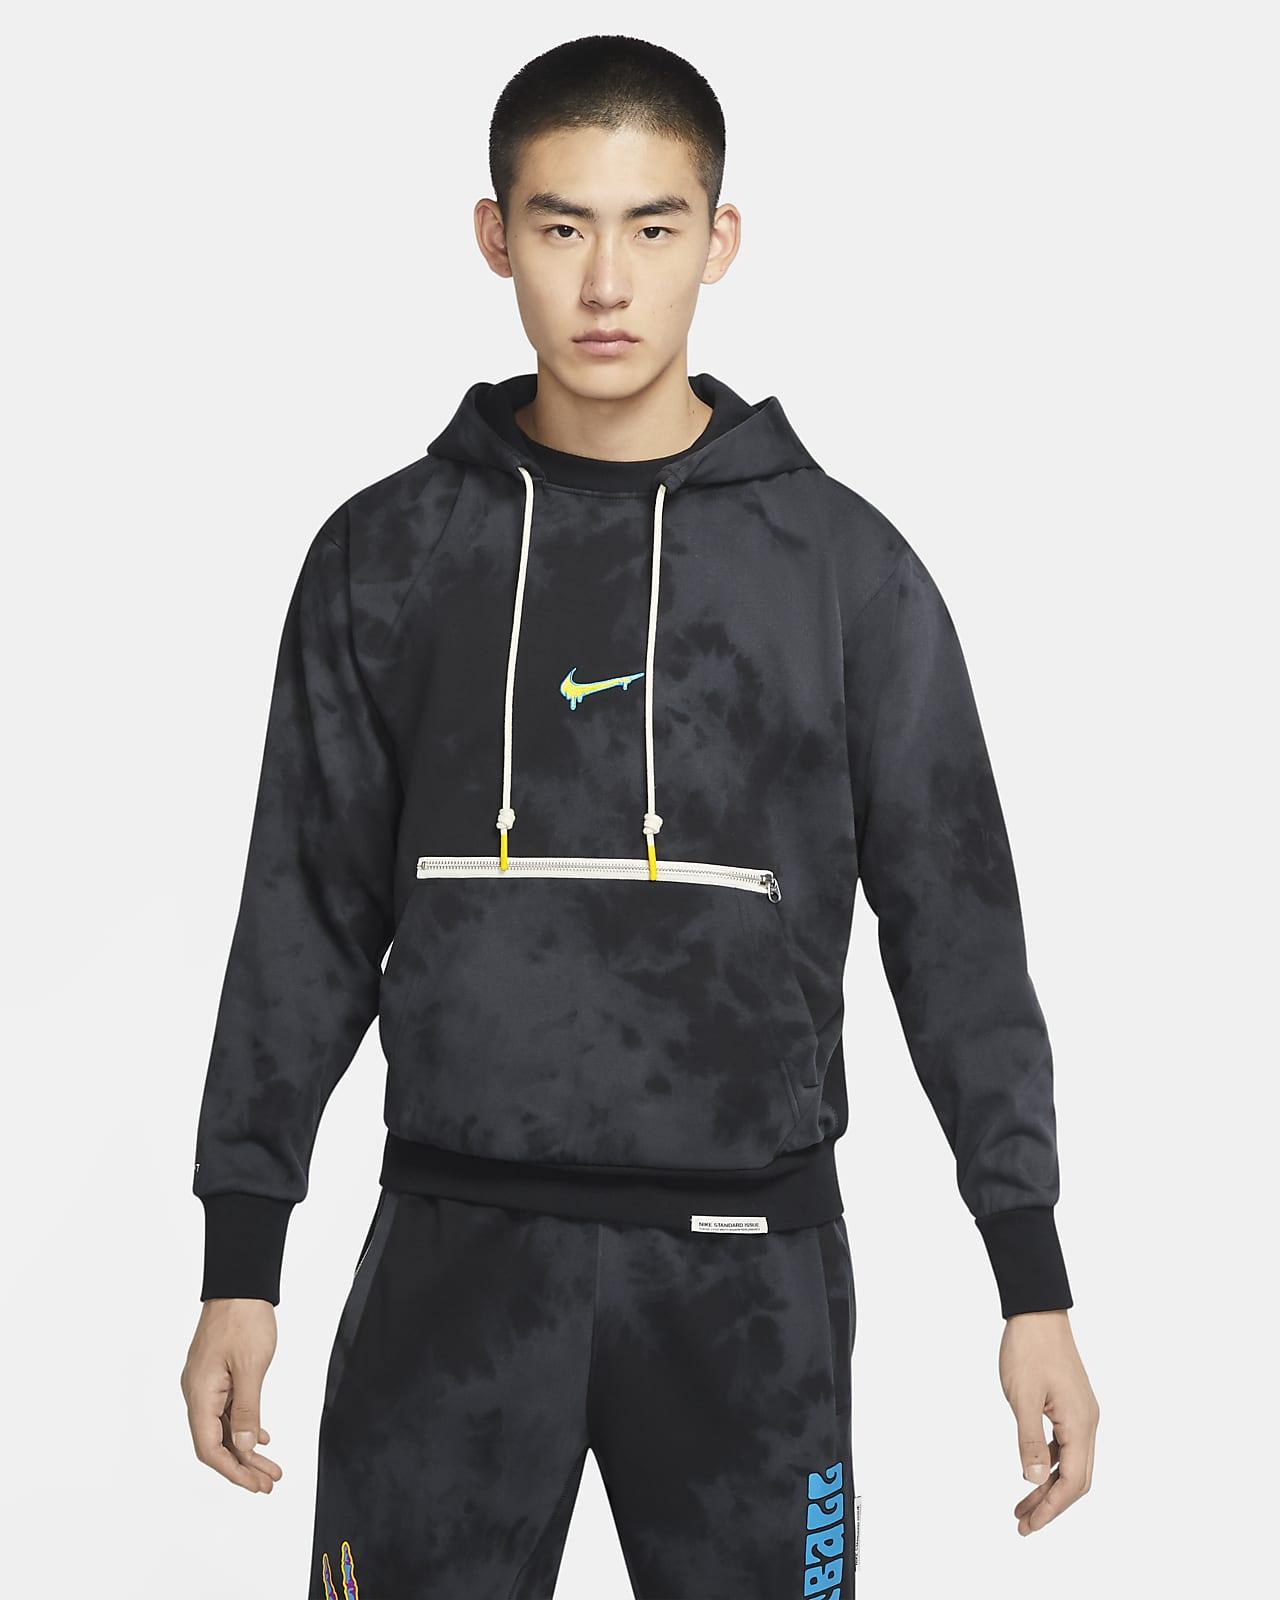 Nike Hardwood 男子篮球套头连帽衫